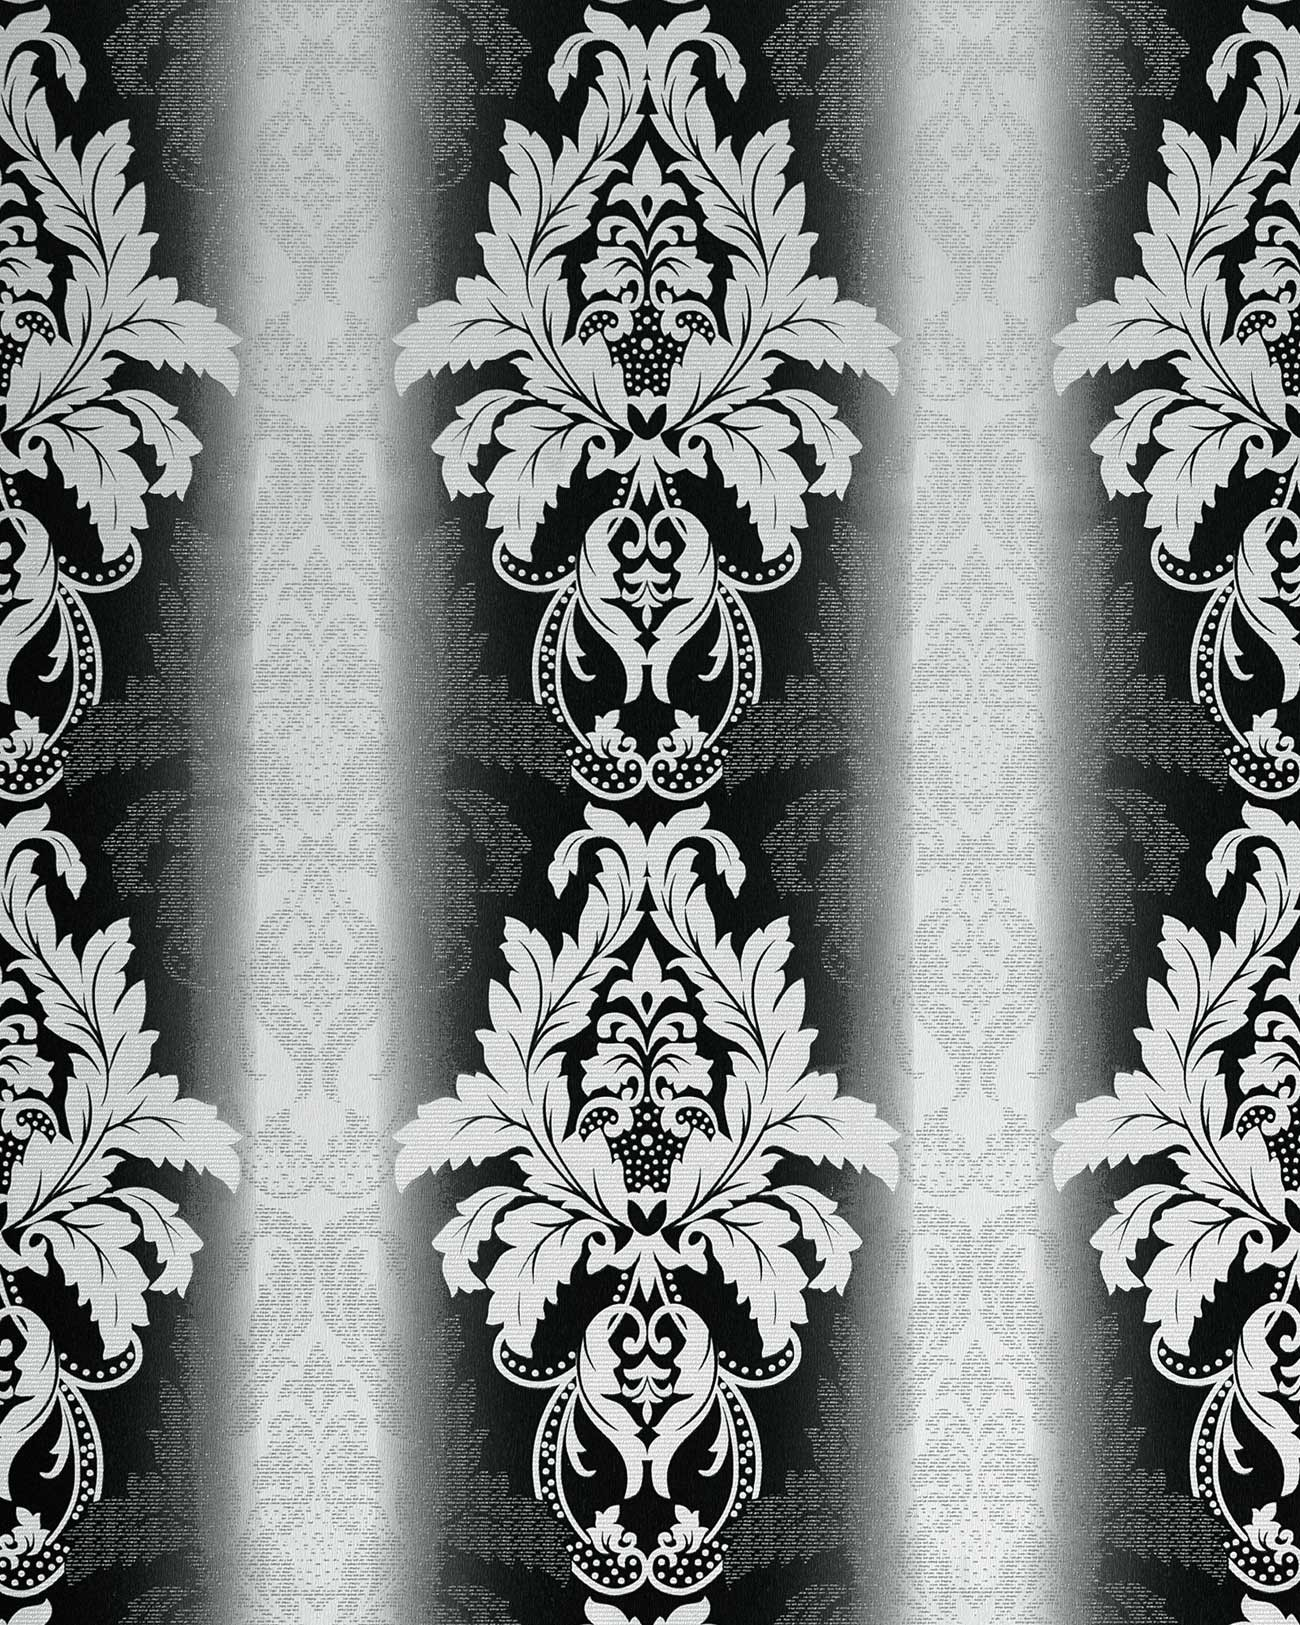 Papel pintado barroco damasco gofrado edem 770 30 de alta for Papel pintado estampado